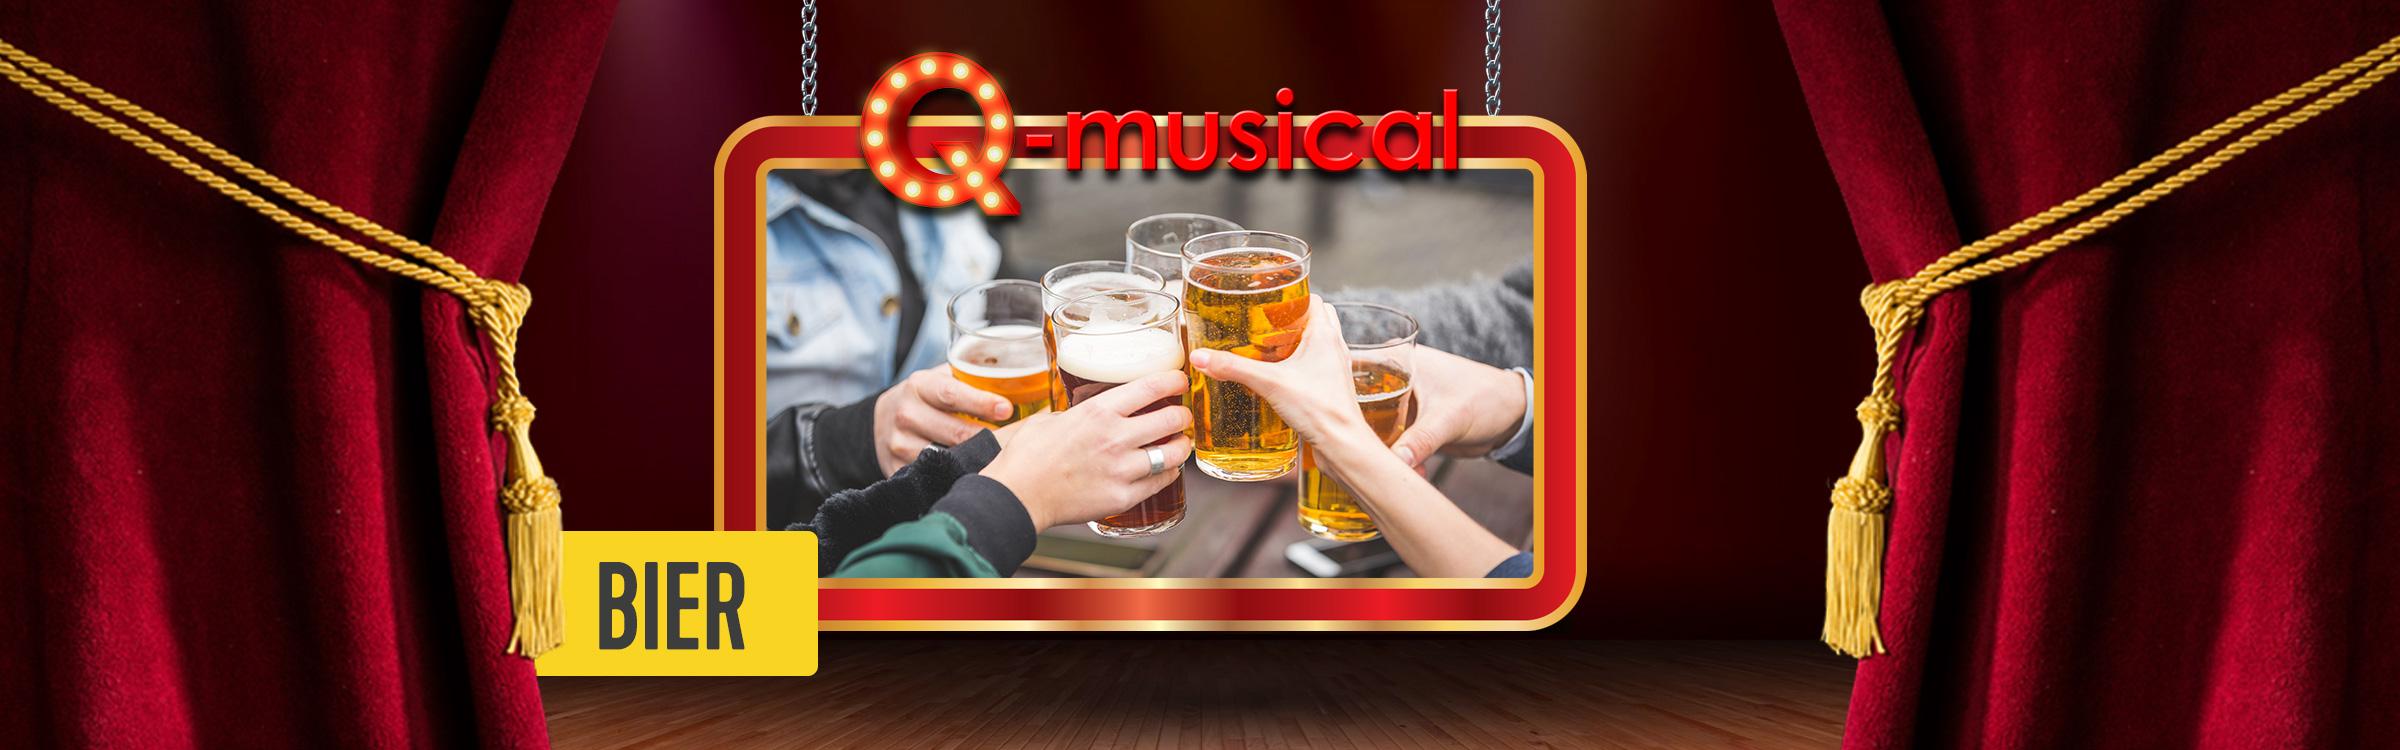 Q musical site thumb template